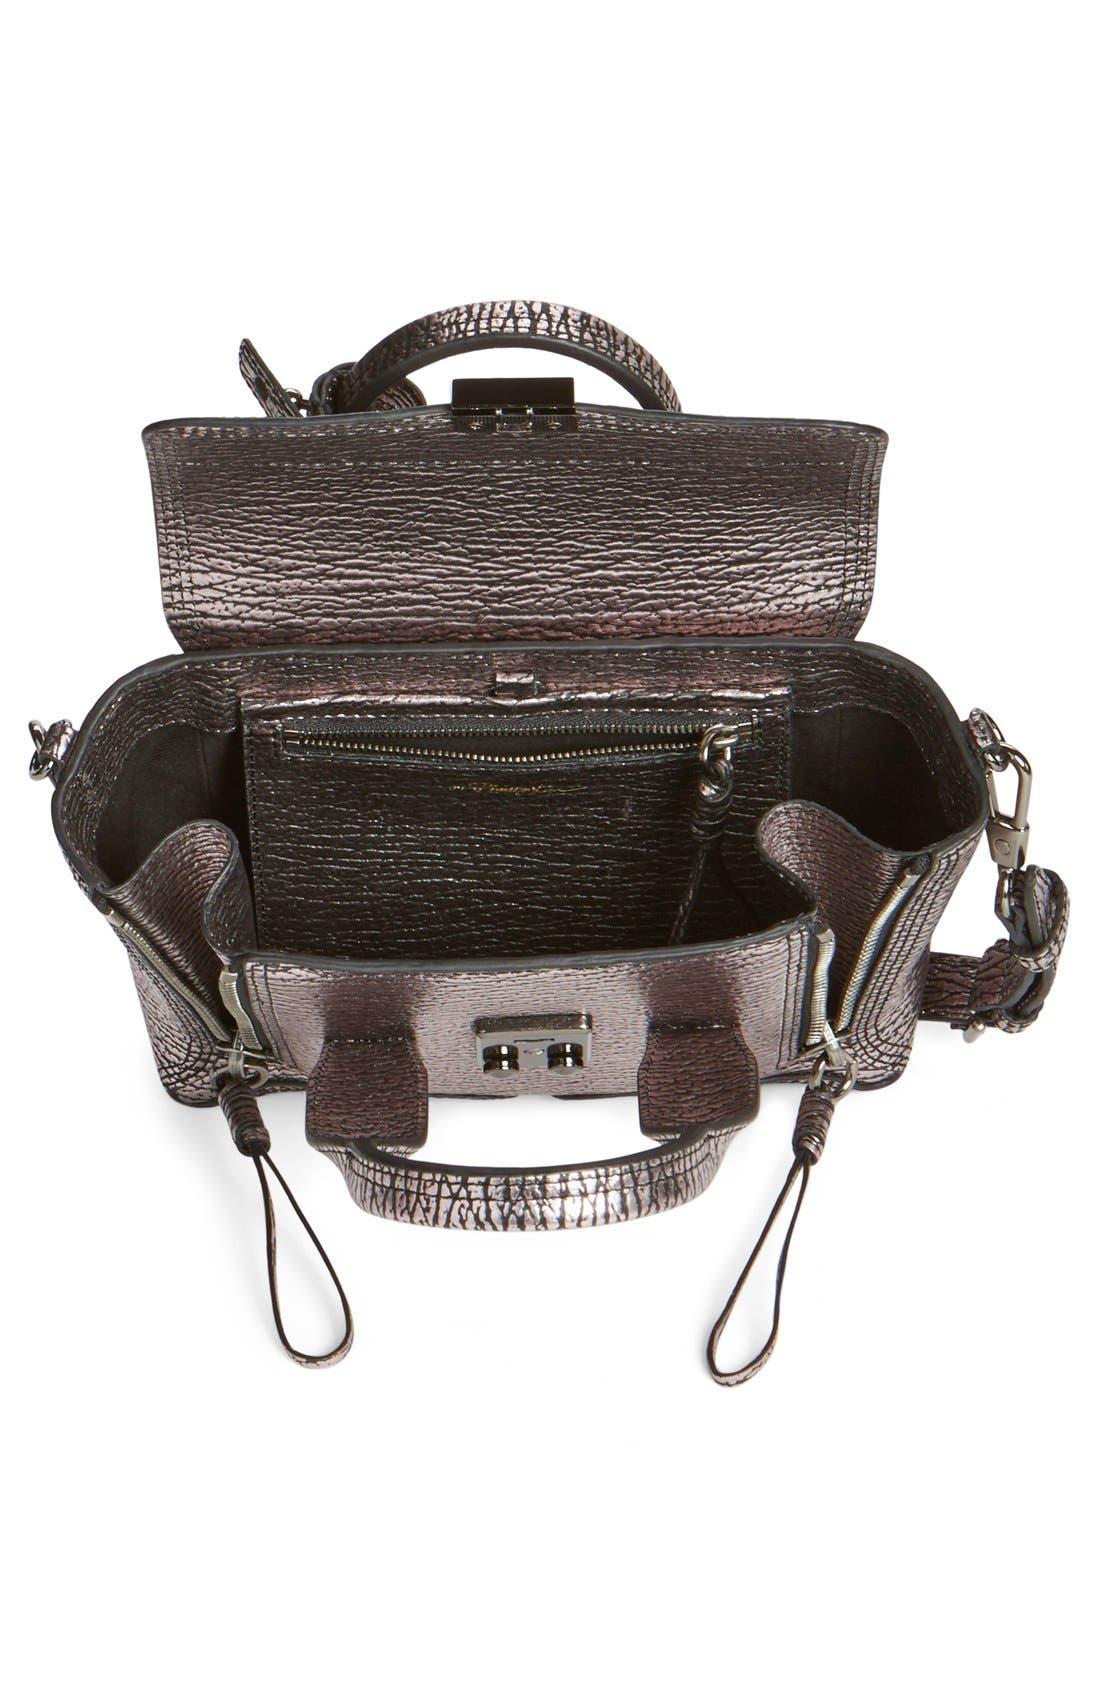 Alternate Image 3  - 3.1 Phillip Lim 'Mini Pashli' Metallic Leather Satchel